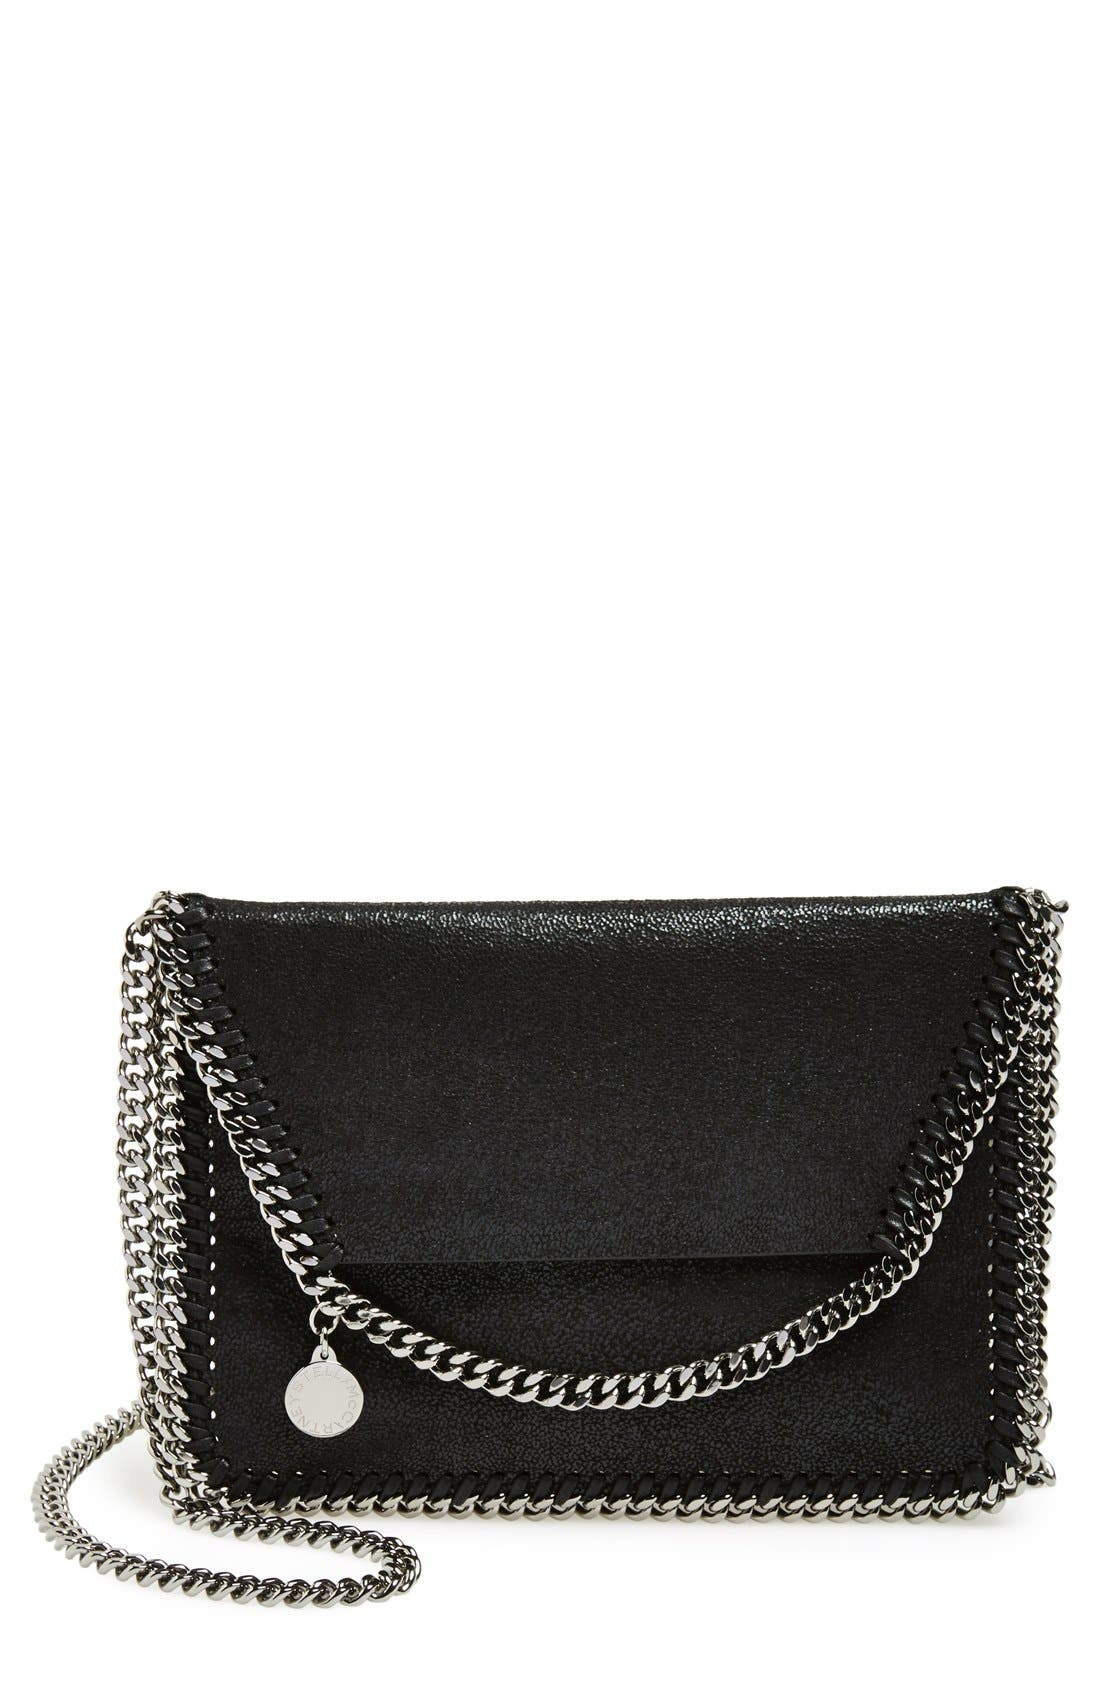 'Mini Falabella - Shaggy Deer' Faux Leather Crossbody Bag,                             Main thumbnail 1, color,                             001